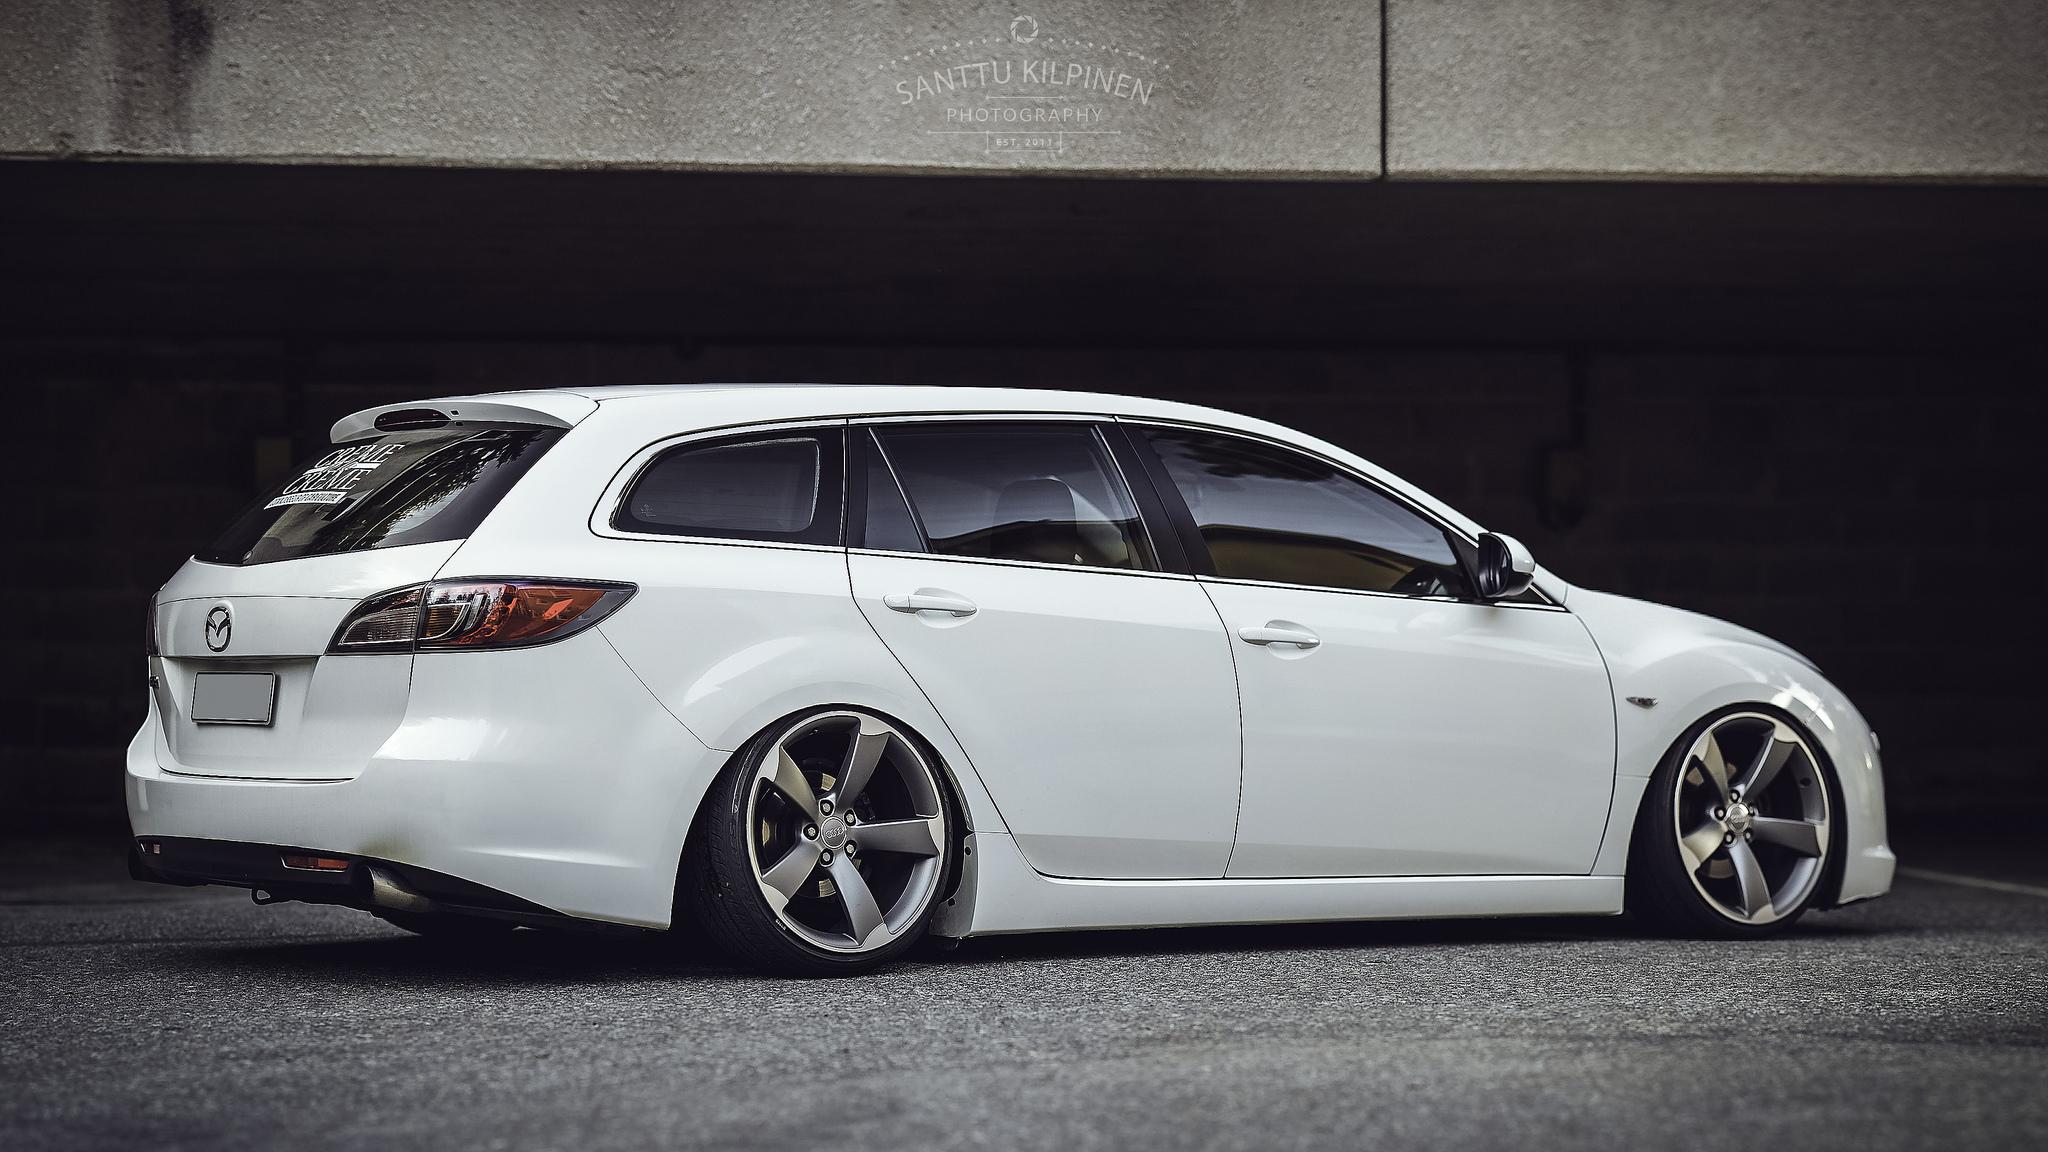 2018 Mazda Rx7 >> Slammed Mazda 6 Wagon! | StanceNation™ // Form > Function